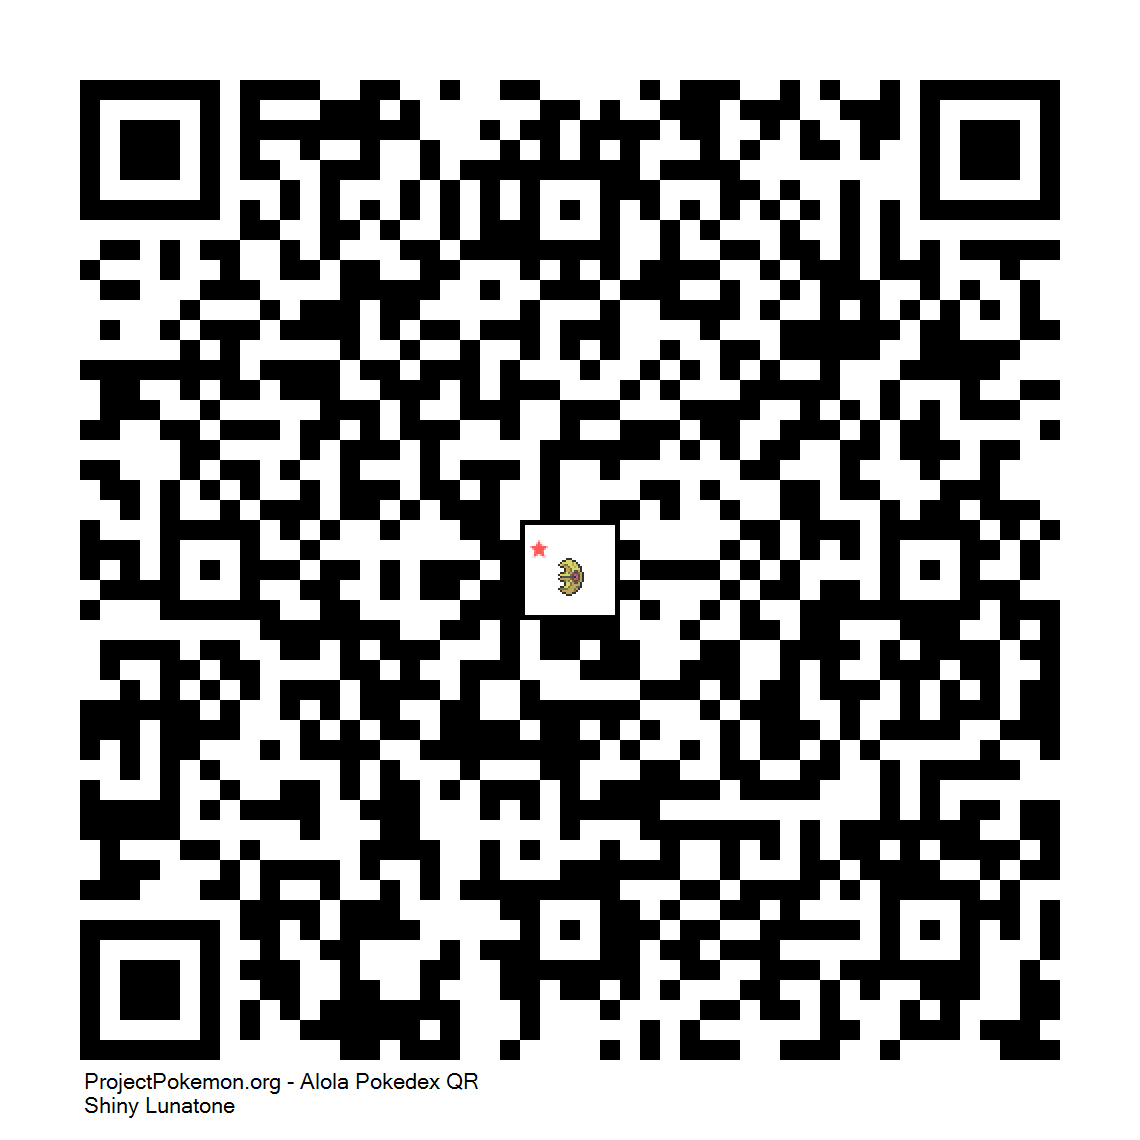 337 Shiny Lunatonepng Generation 7 Qr Codes Project Pokemon